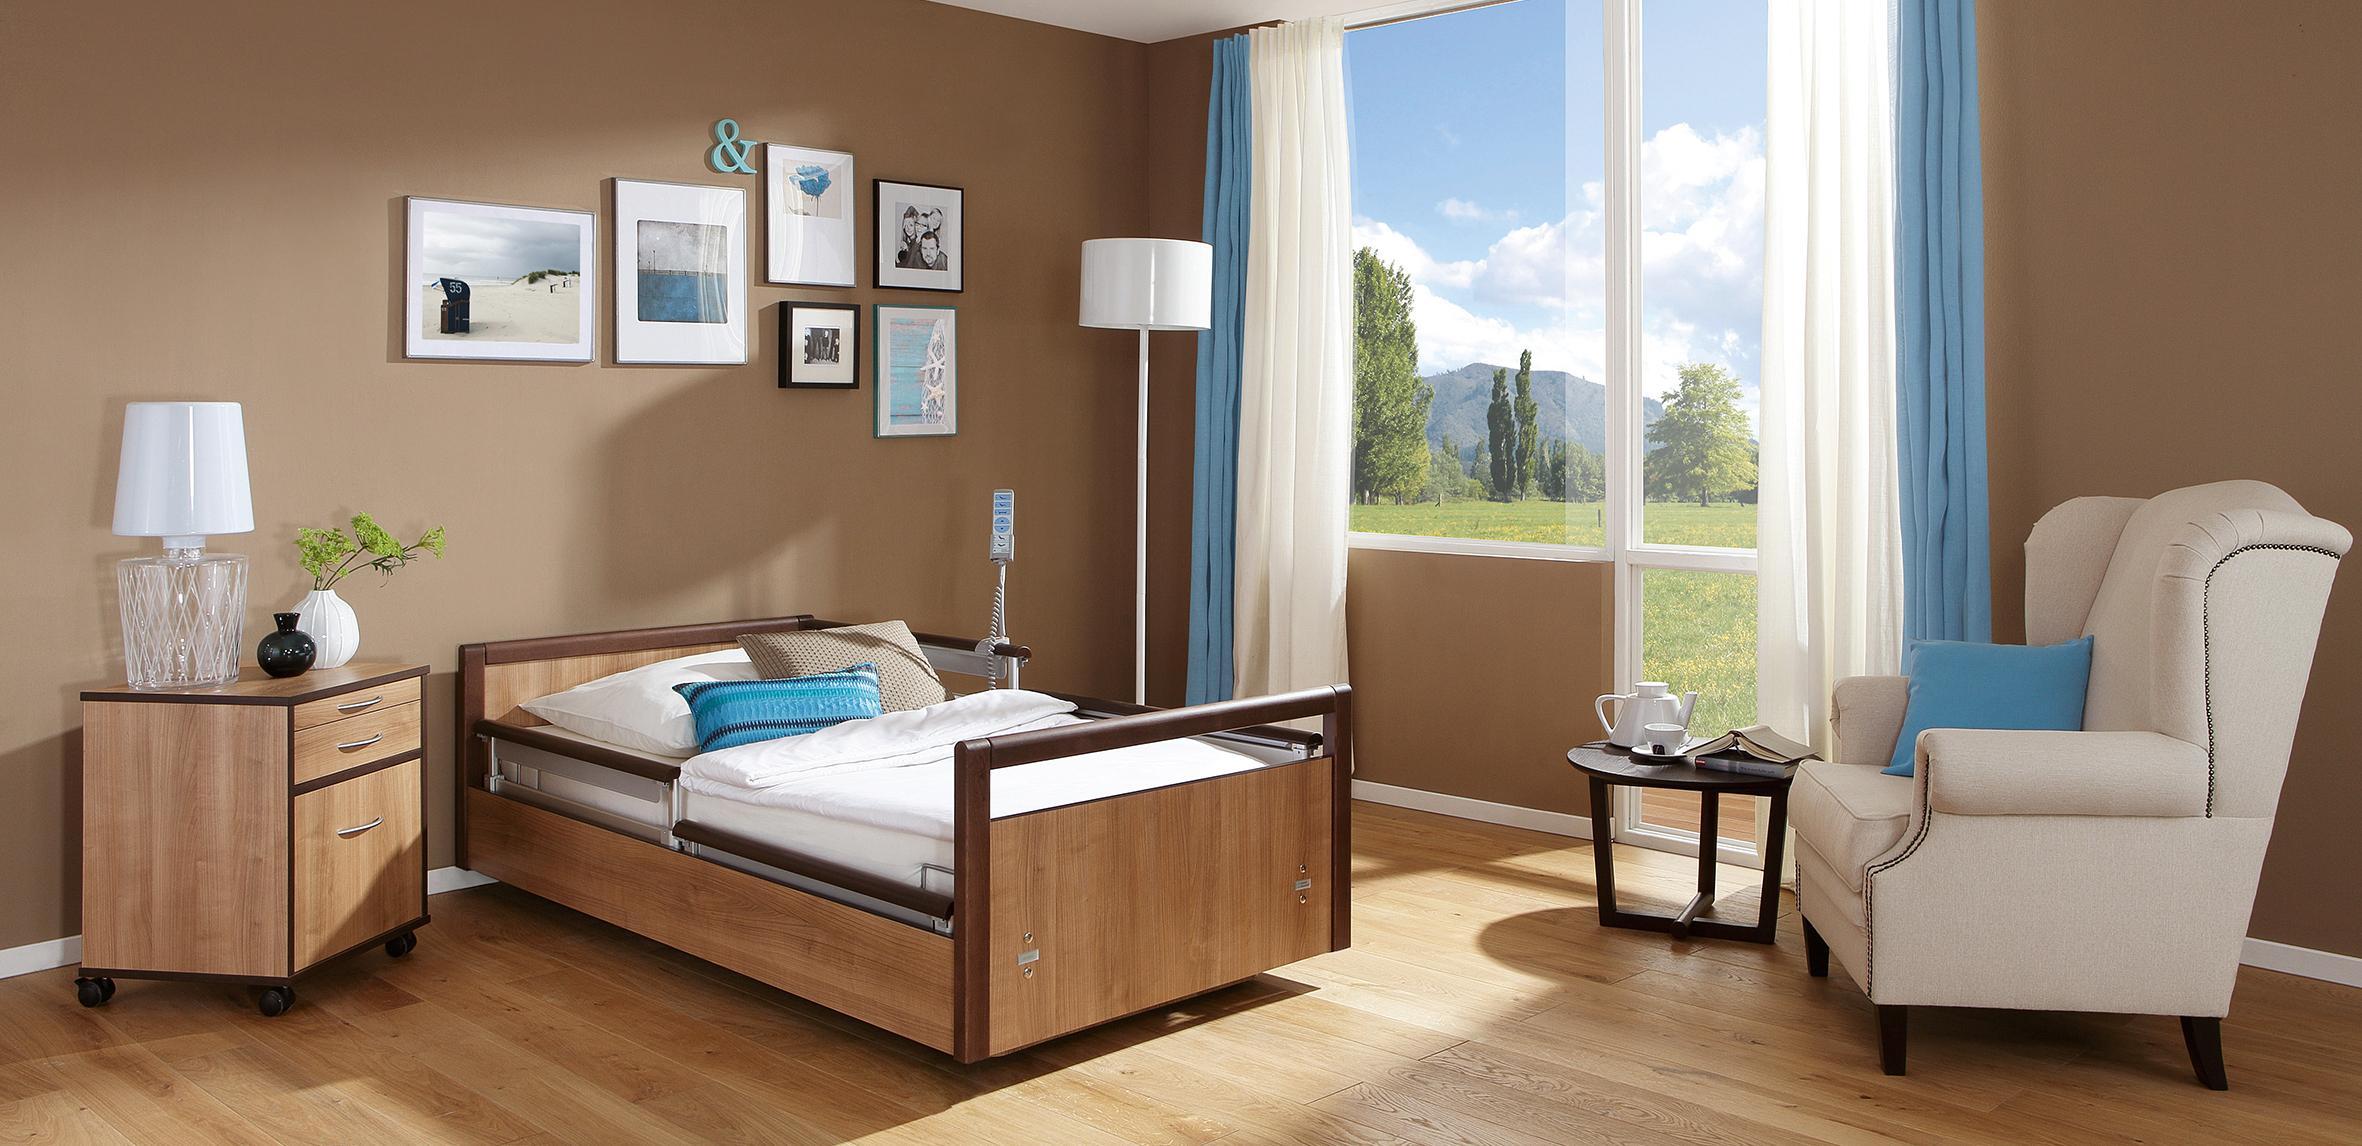 komfortzone patientenzimmer teil 2 pflege. Black Bedroom Furniture Sets. Home Design Ideas